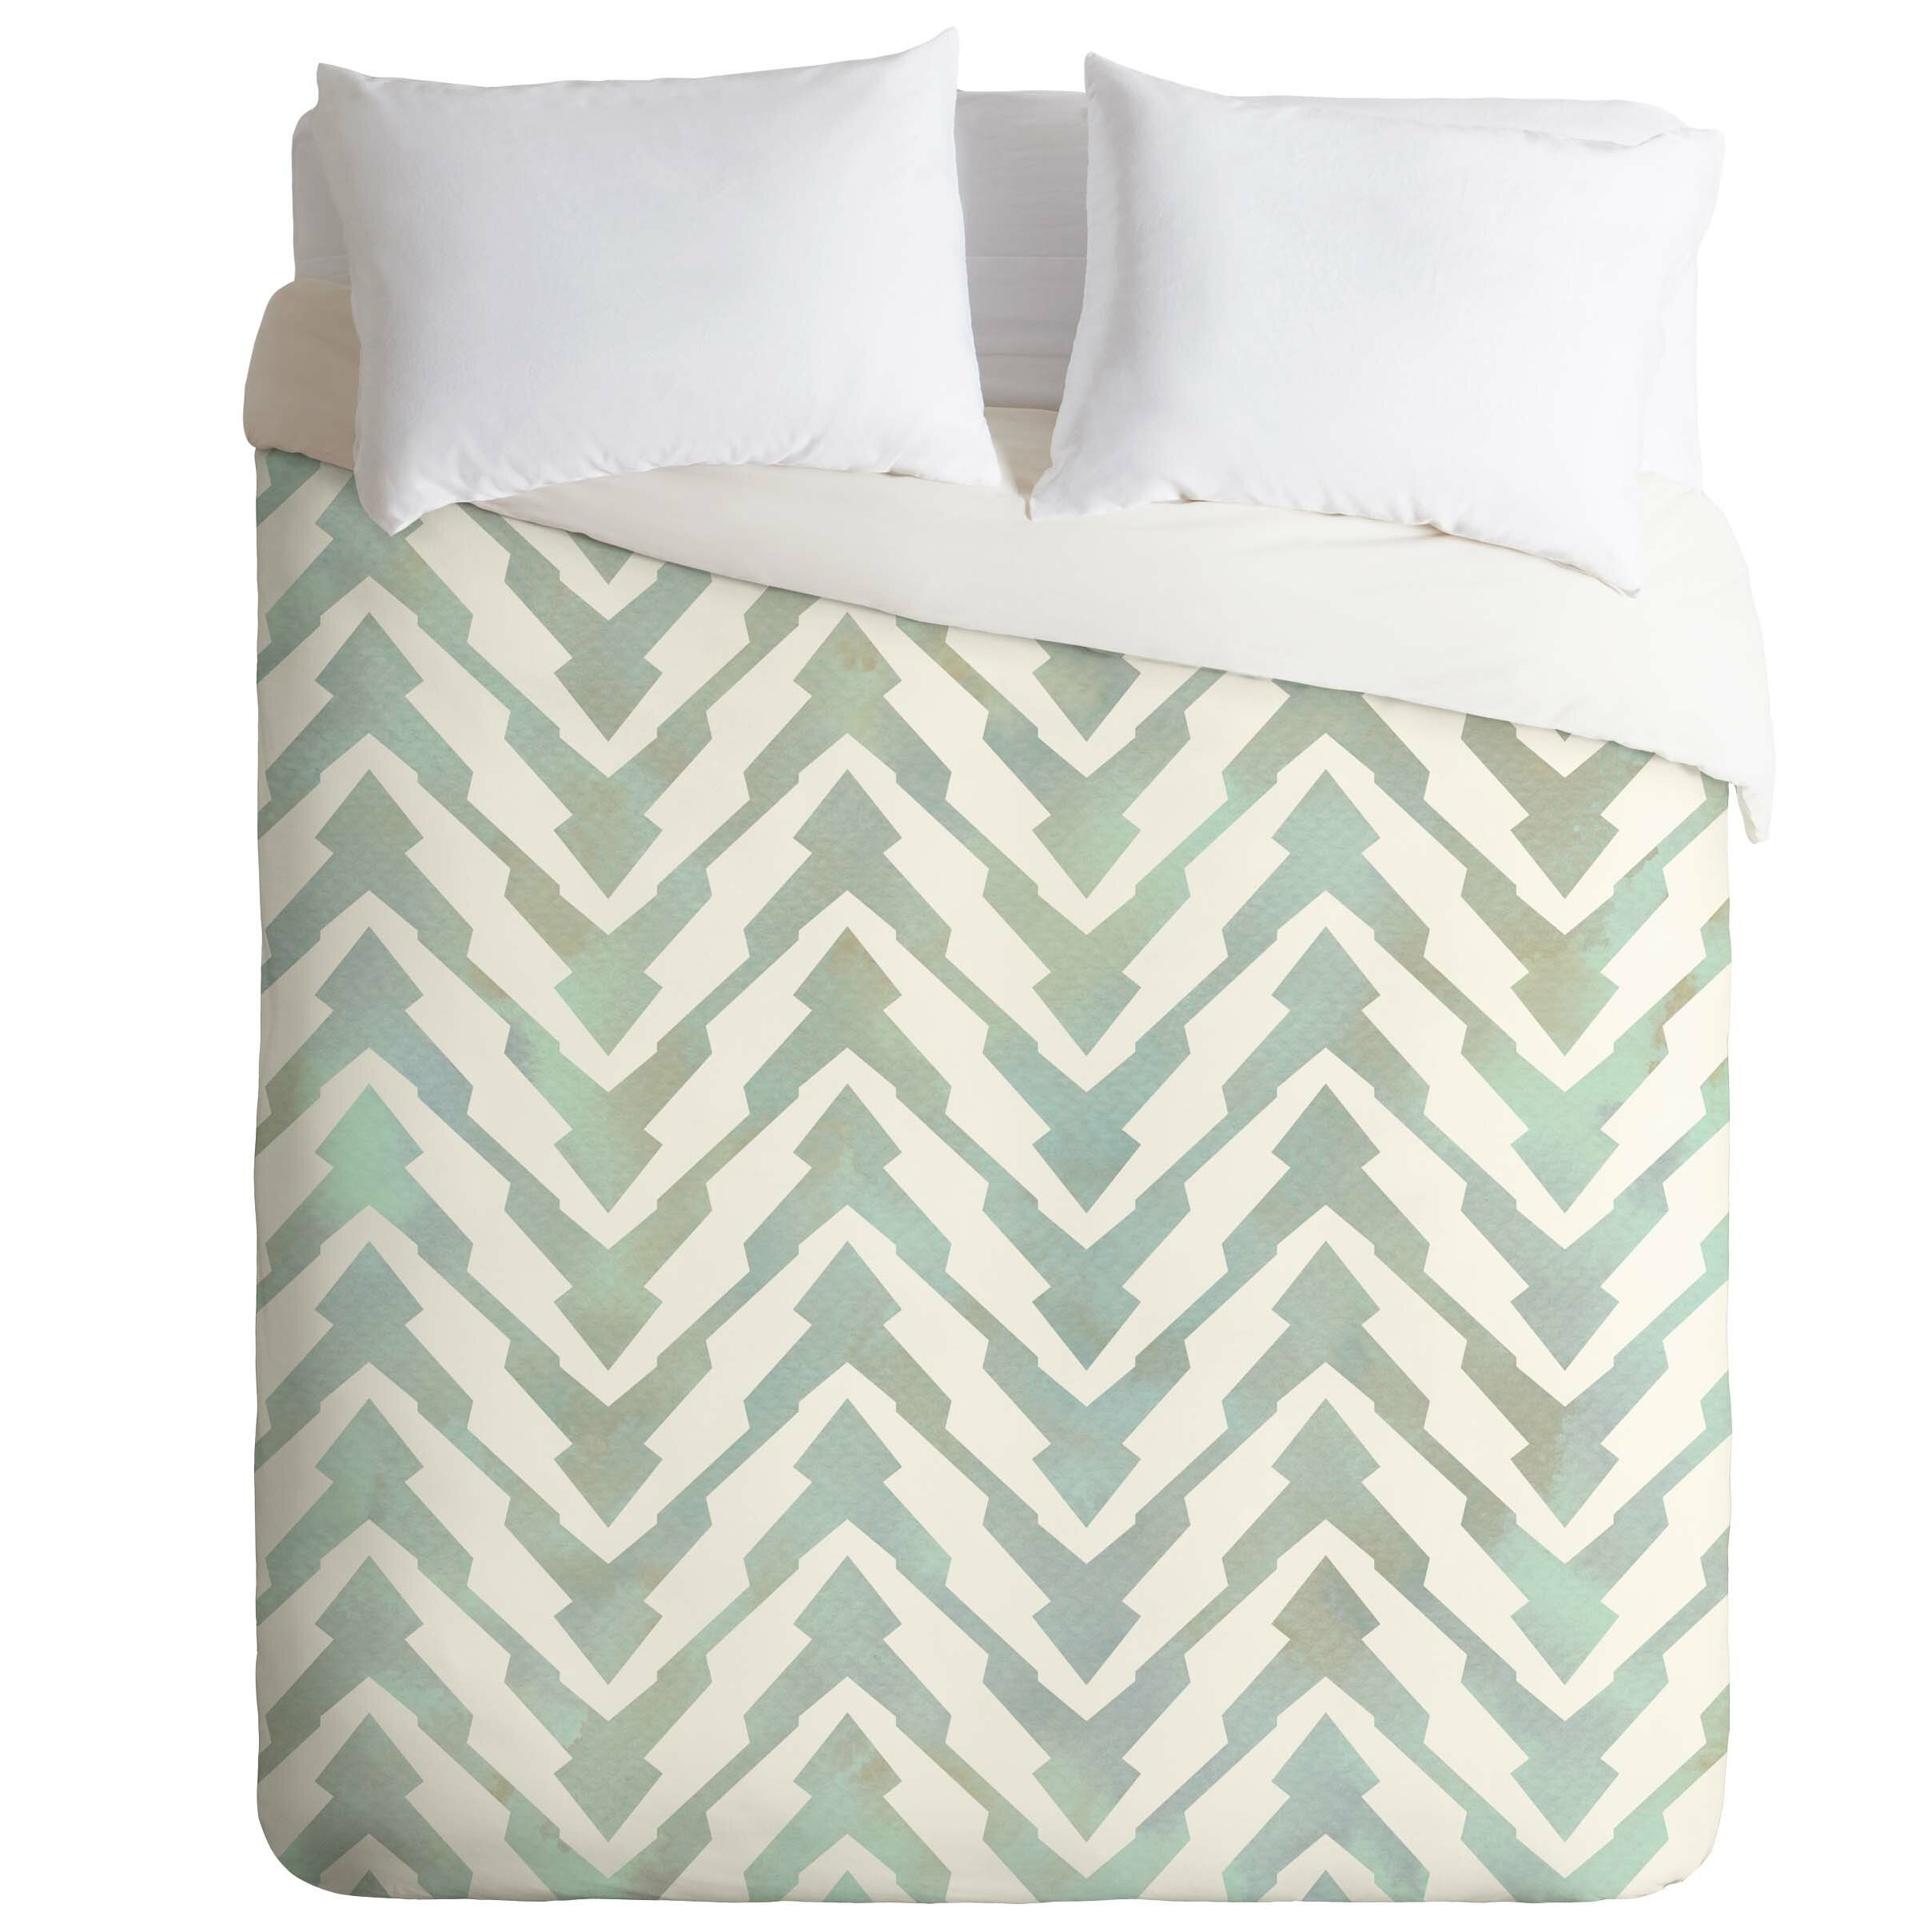 Zig Zag Chevron Grey Cream Cotton Blend Single Duvet Cover Bedding Duvets Duvet Covers